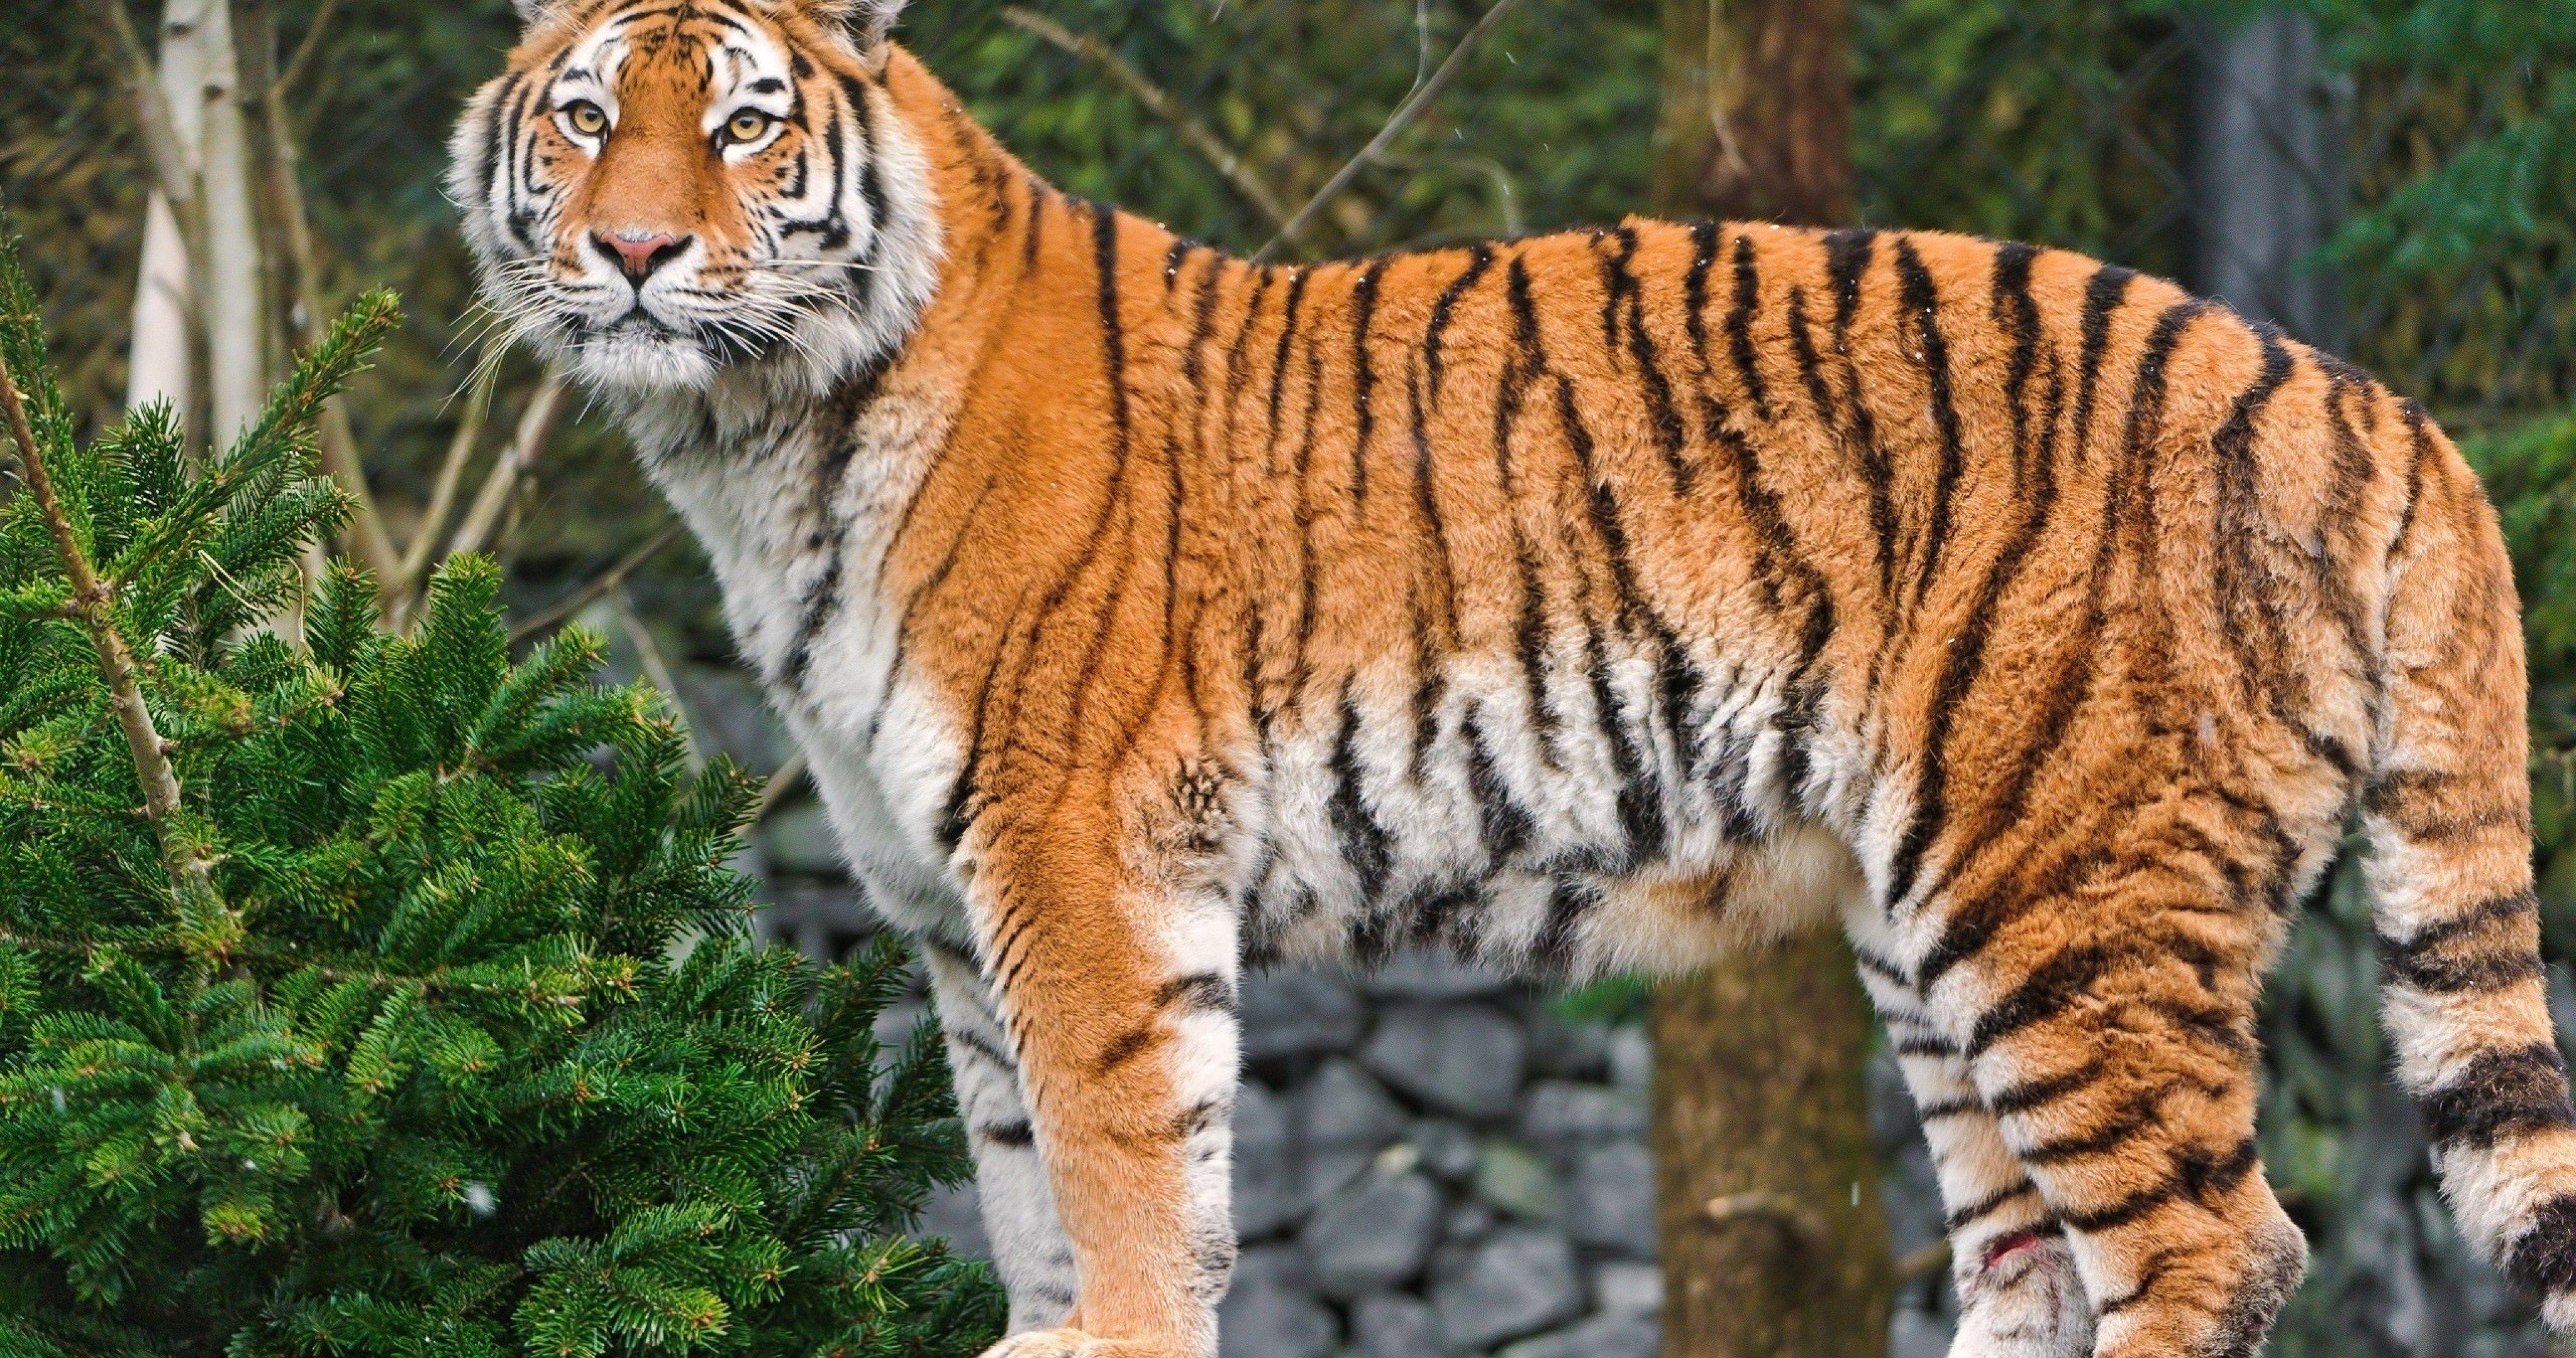 Amazing Tiger Wallpaper Hd 4k Ultra Hd Wallpaper Tiger Wallpaper Animals For Kids Tiger